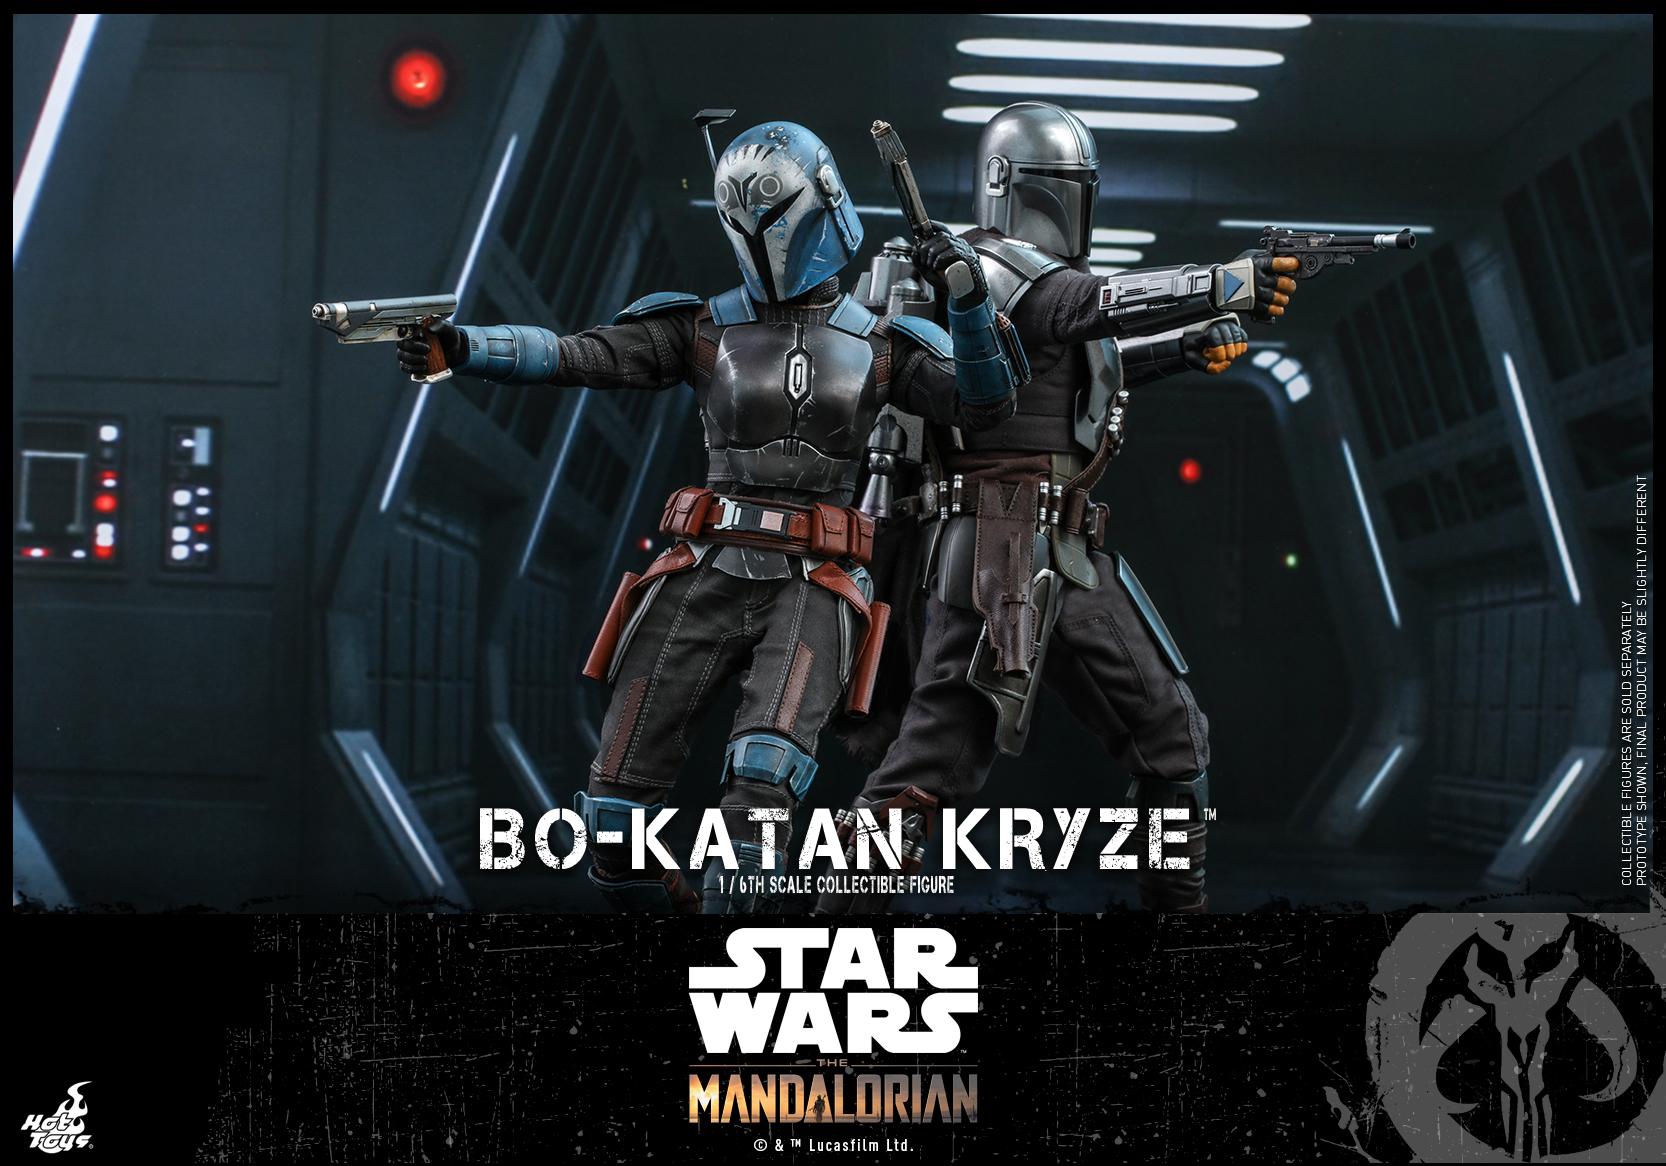 Hot Toys - The Mandalorian (S2) - Bo-Katan Kryze Collectible Figure_PR15